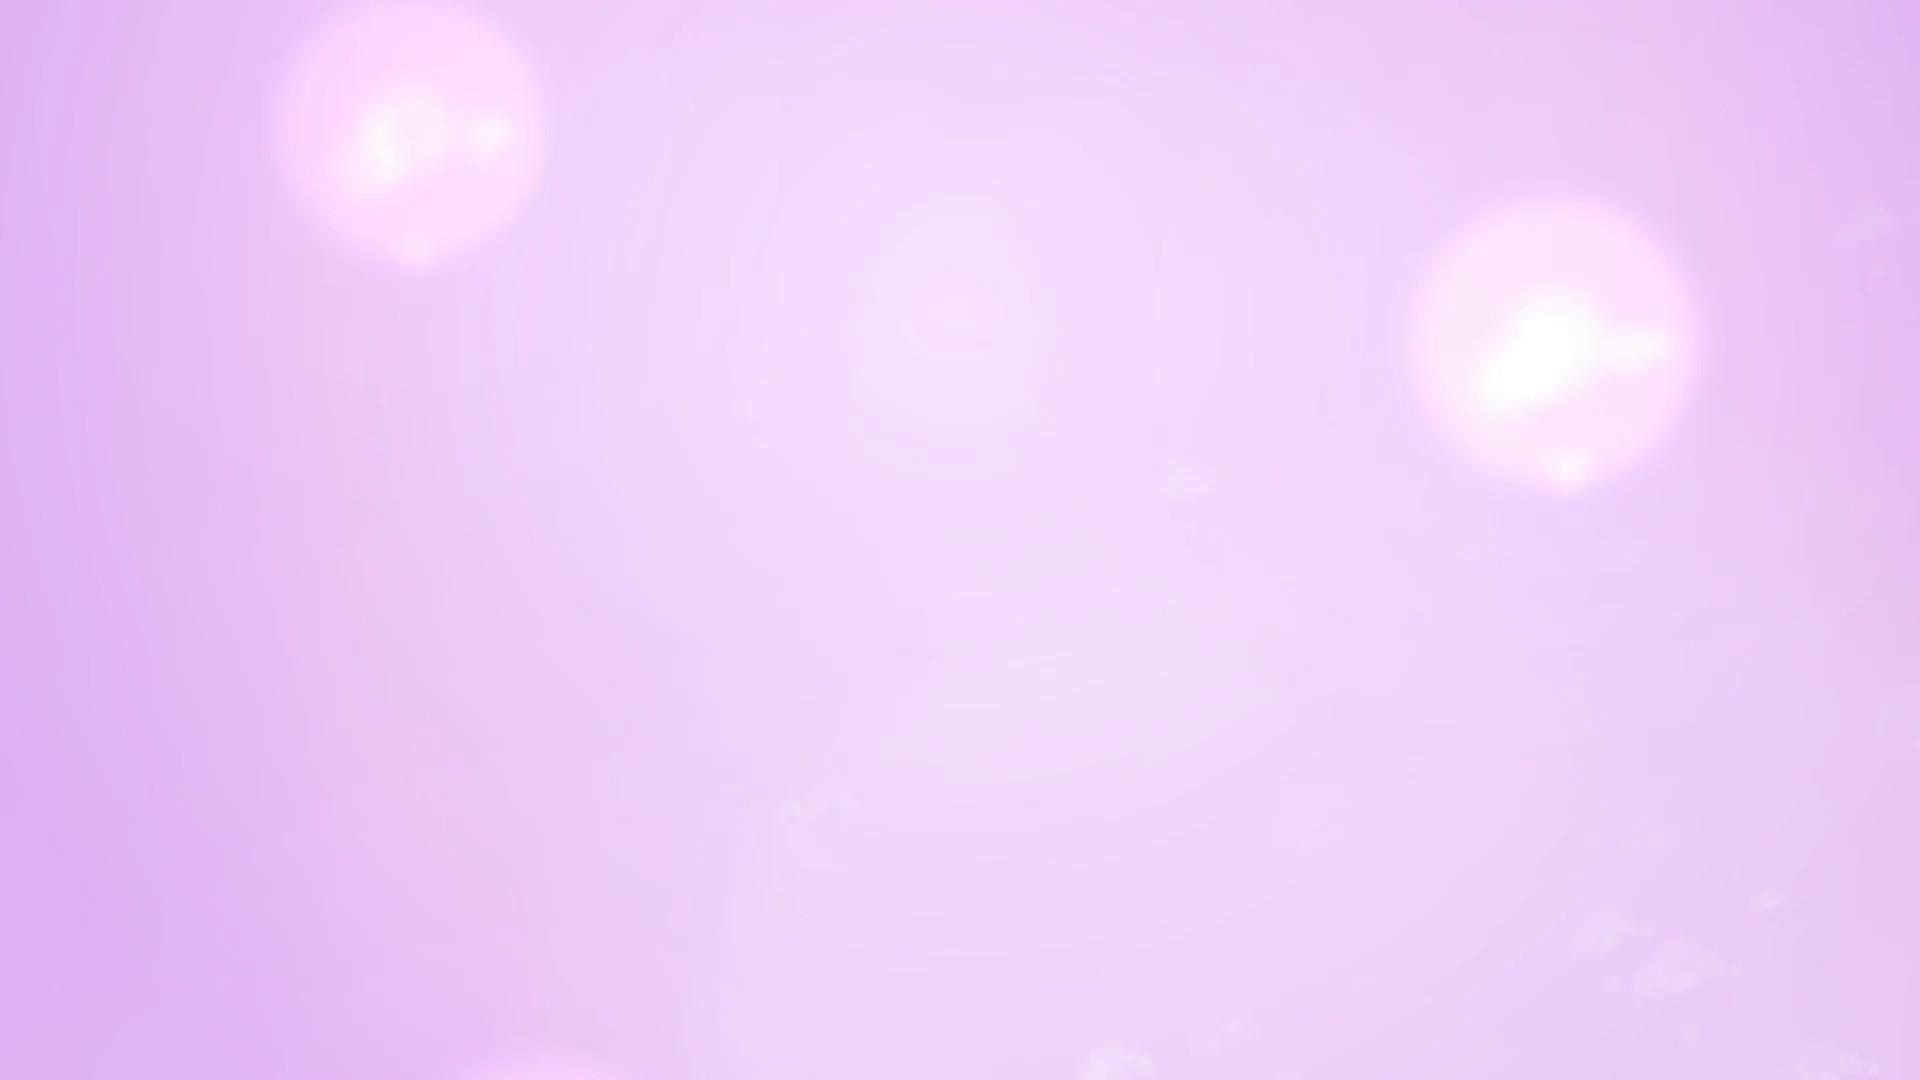 light pink backgrounds 183��